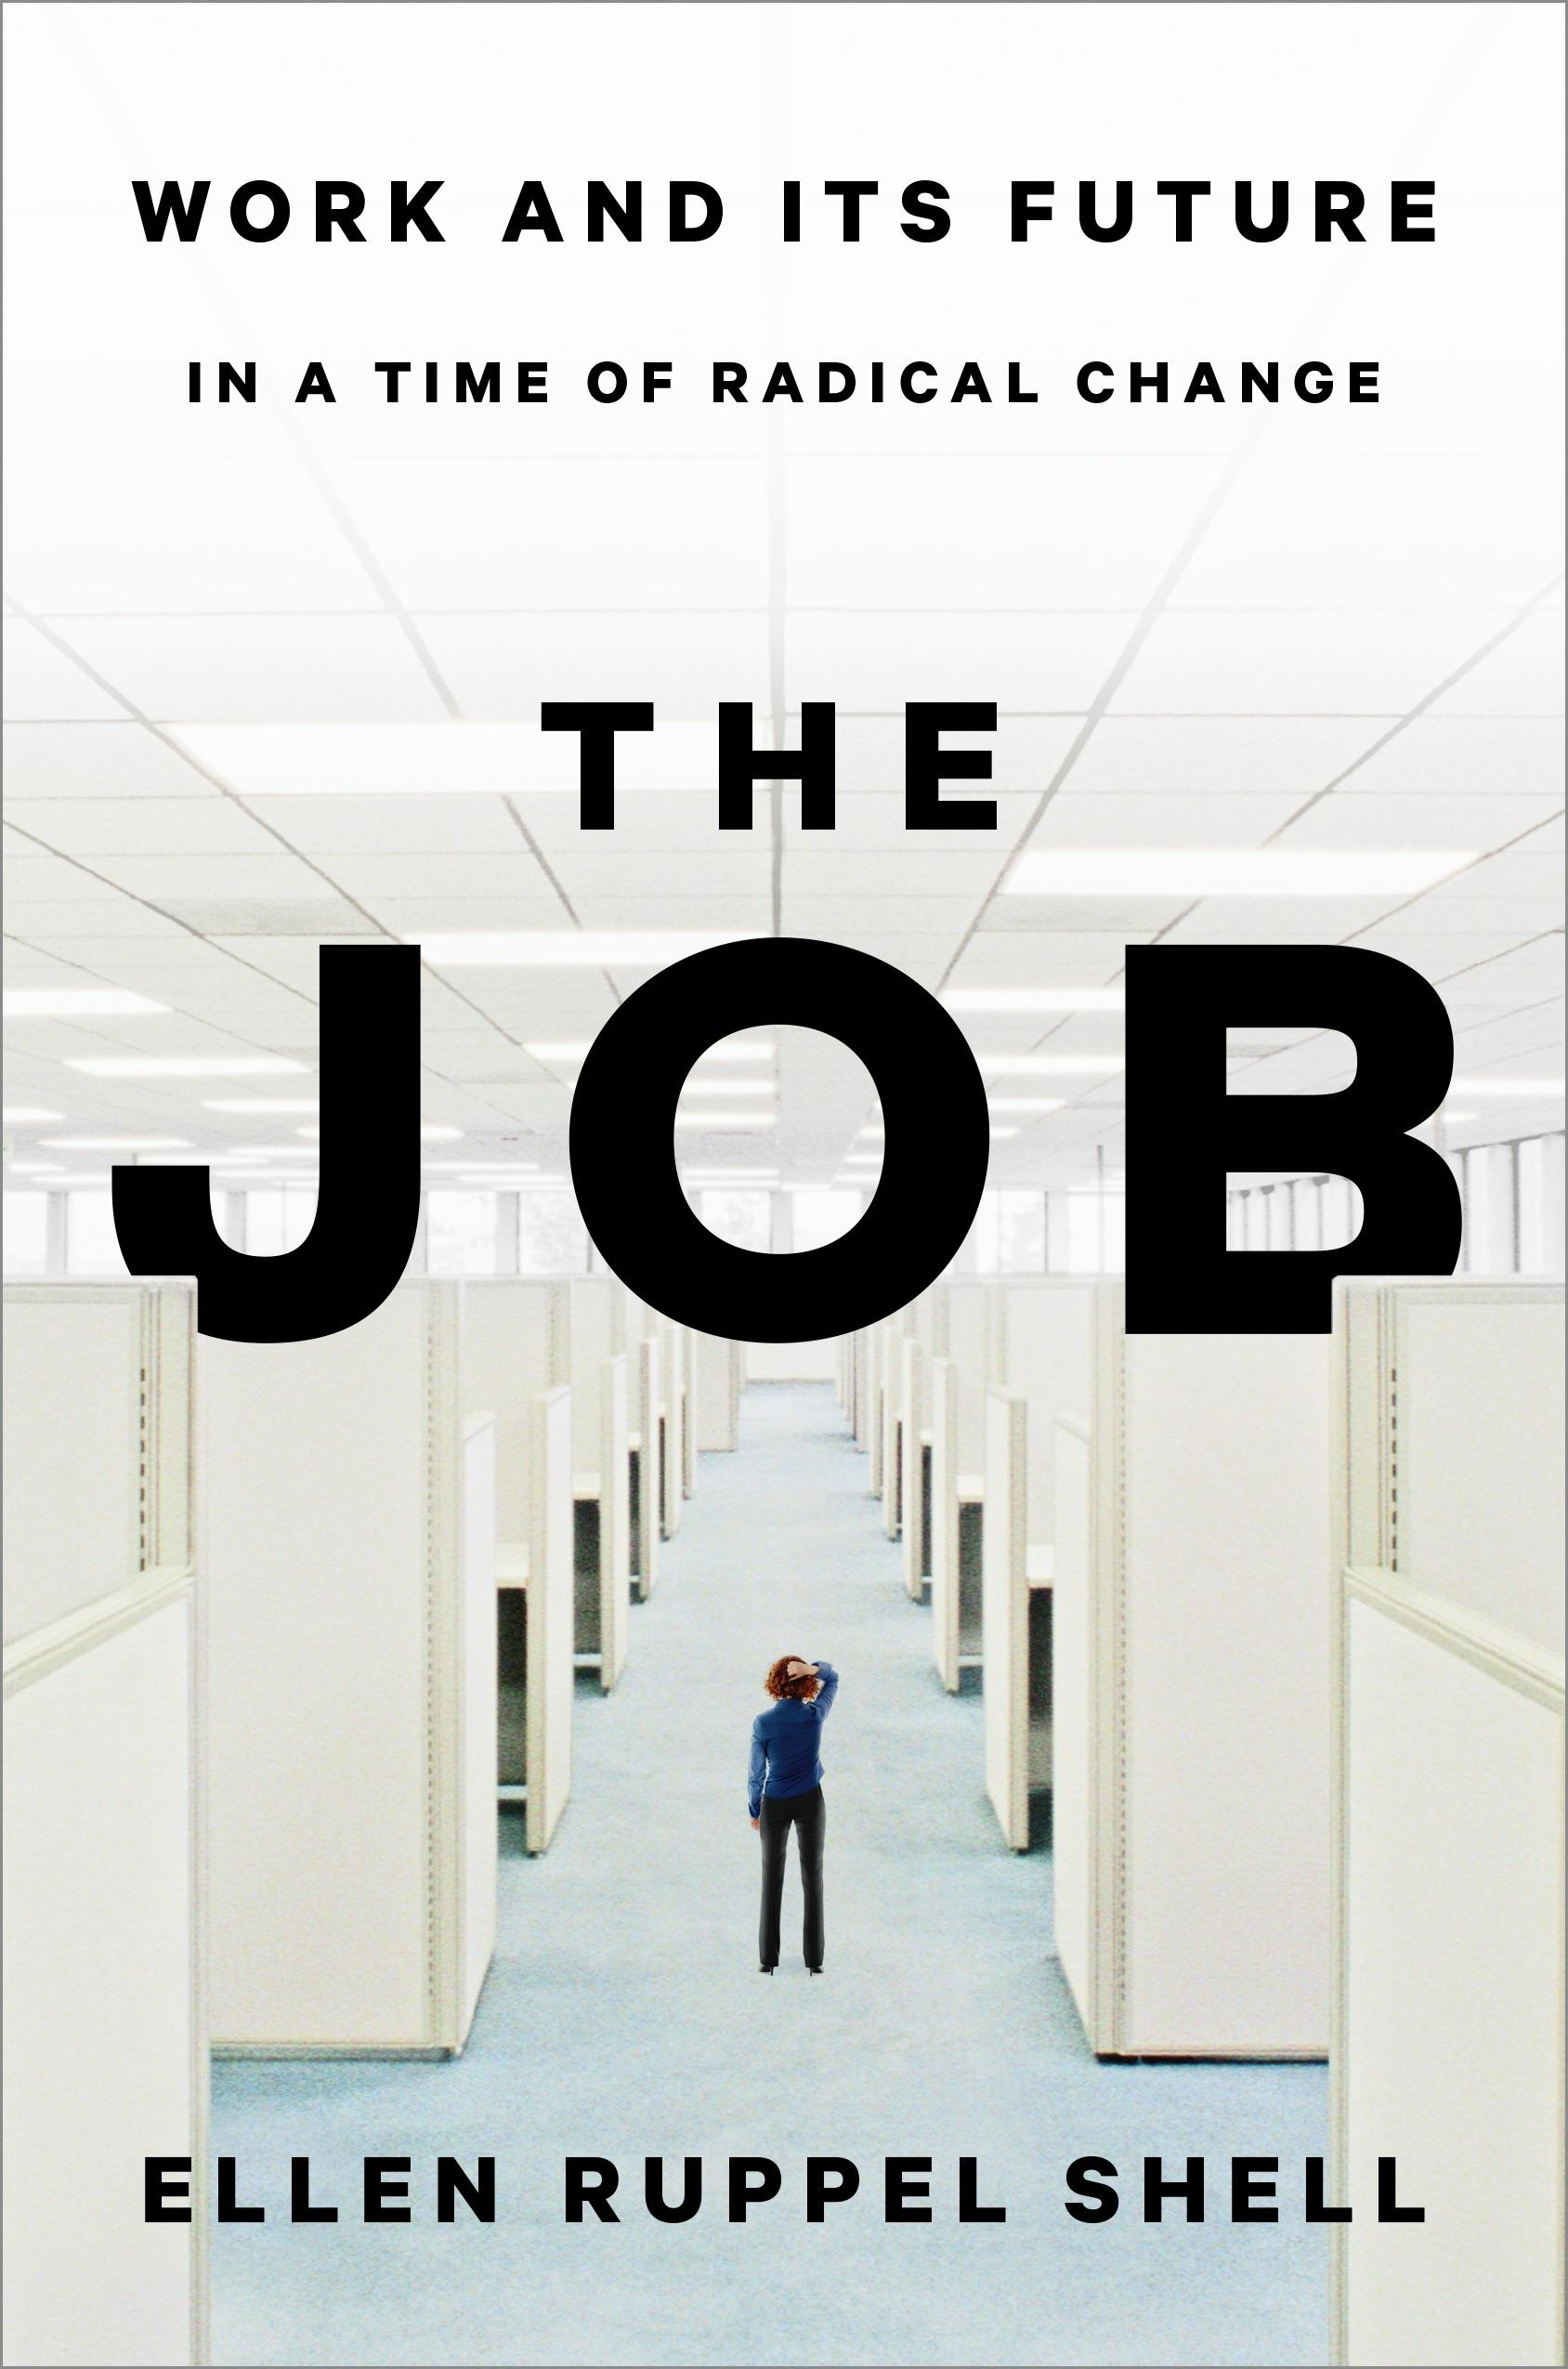 Cover of Ellen Shell's new book The Job.